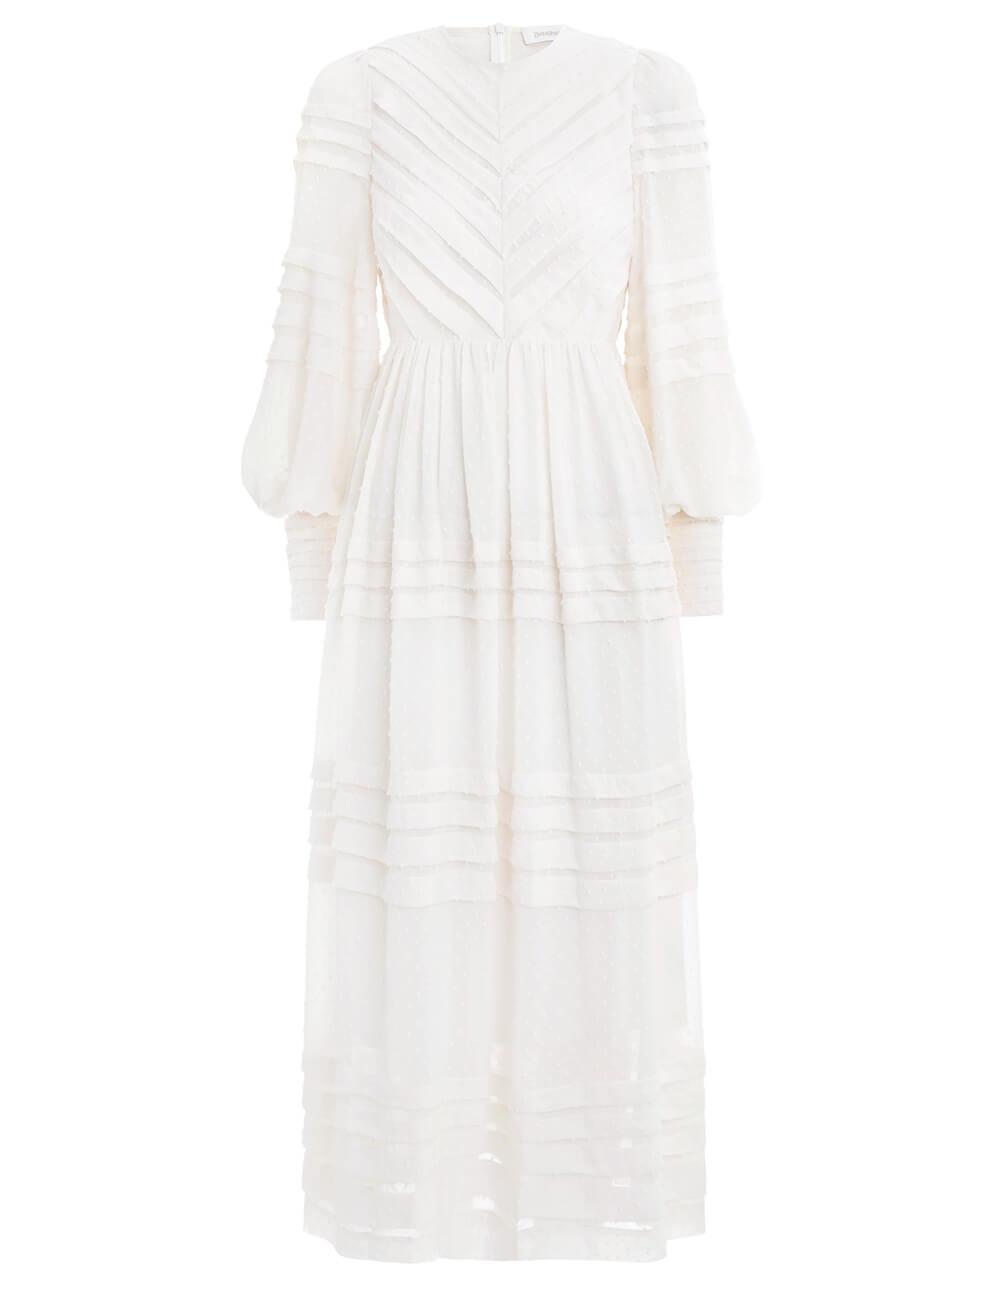 02a942814ac Shop Designer Dresses Online   ZIMMERMANN